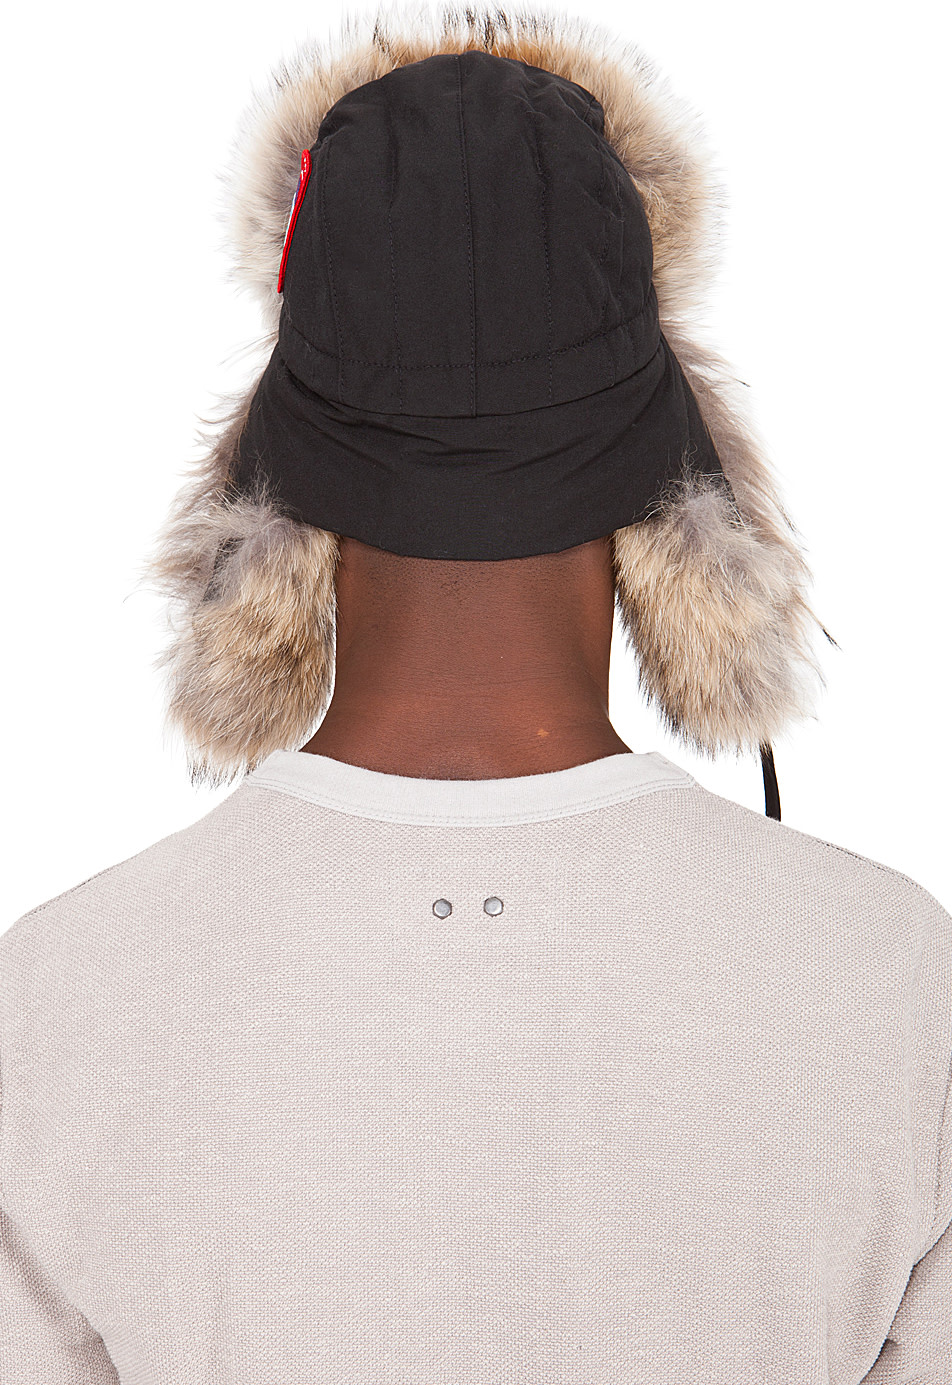 Canada Goose coats replica 2016 - Canada Goose: Black Coyote Fur Aviator Hat   SSENSE